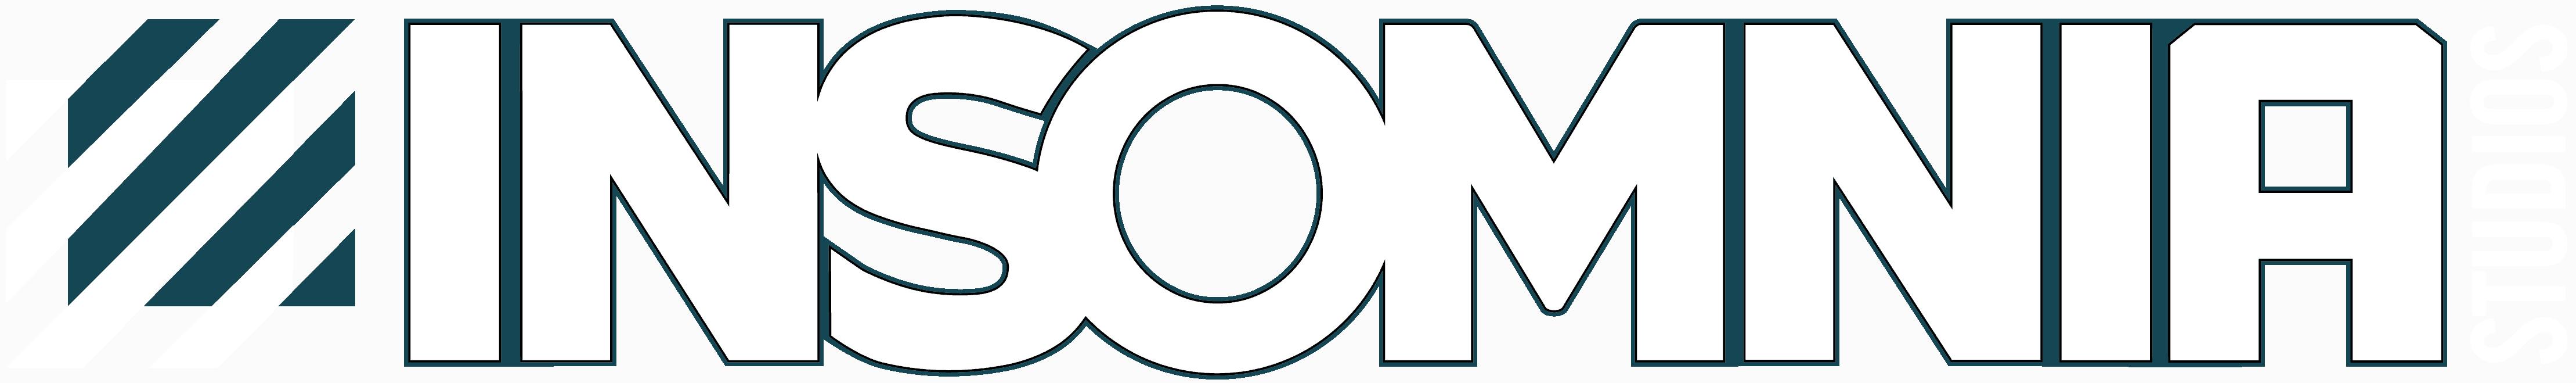 Insomnia Studios Logo